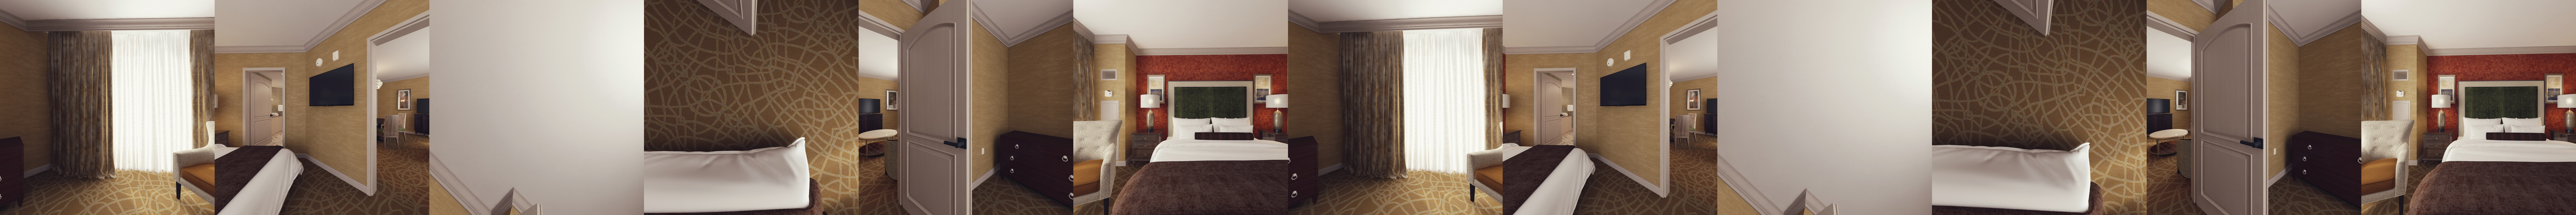 4D Immersive Suite Bed Room